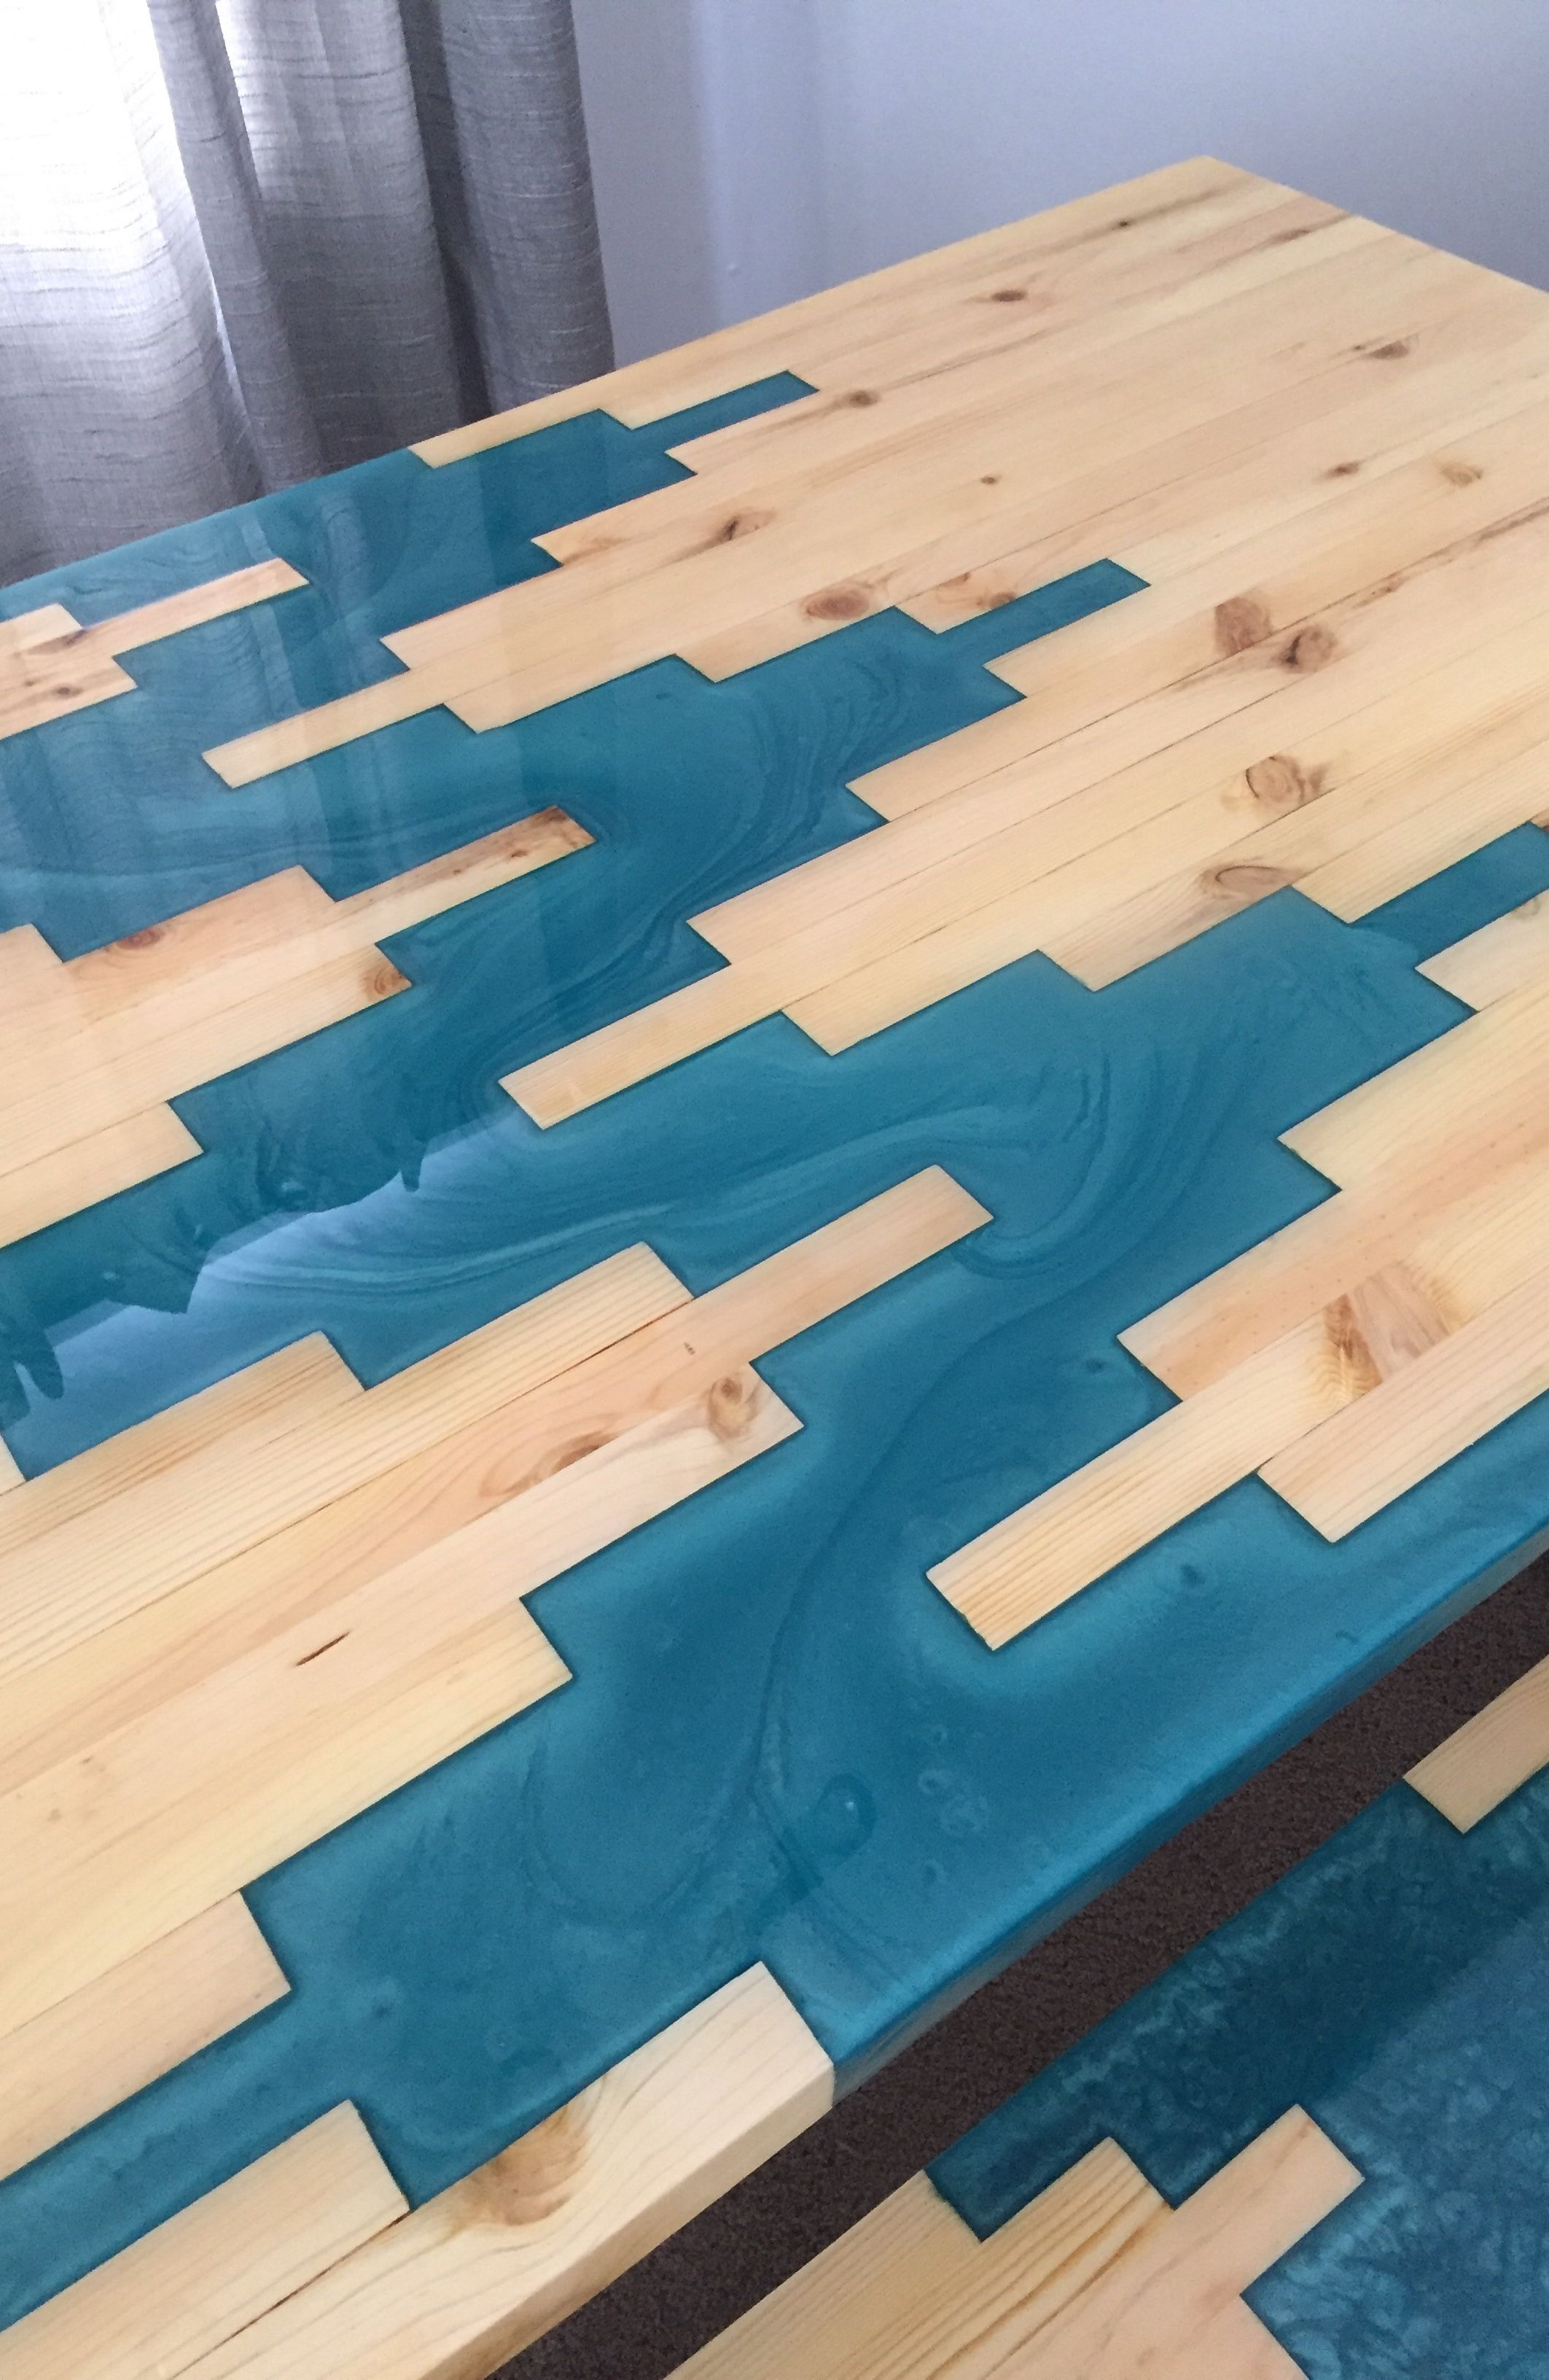 Custom Built Epoxy Resin Geometric River Wood Table Wood Table Diy Epoxy Resin Table Resin Furniture